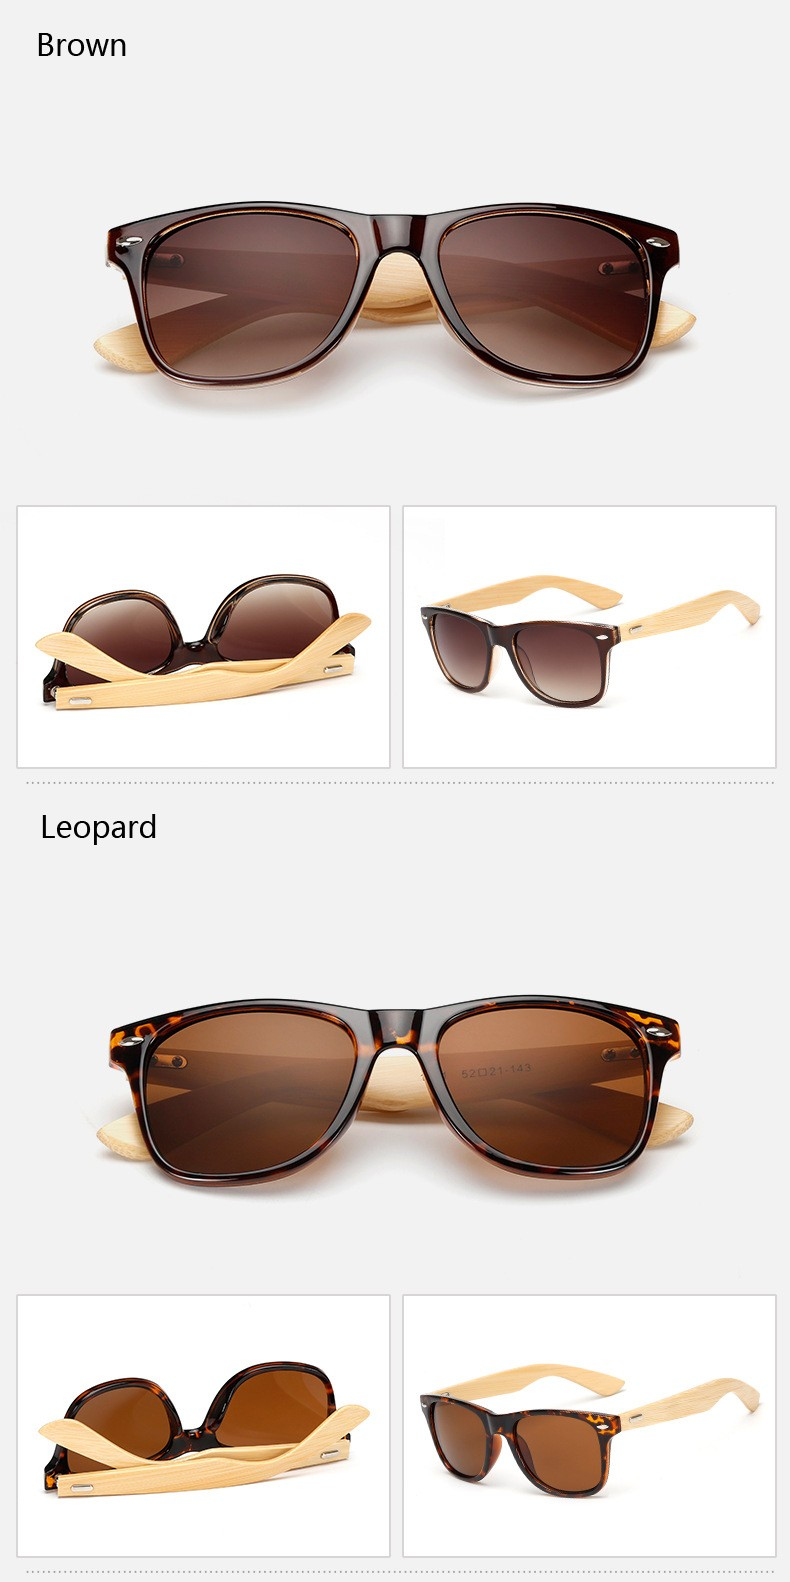 Ralferty Retro Wood Sunglasses Men Bamboo Sunglass Women Brand Design Sport Goggles Gold Mirror Sun Glasses Shades lunette oculo 8